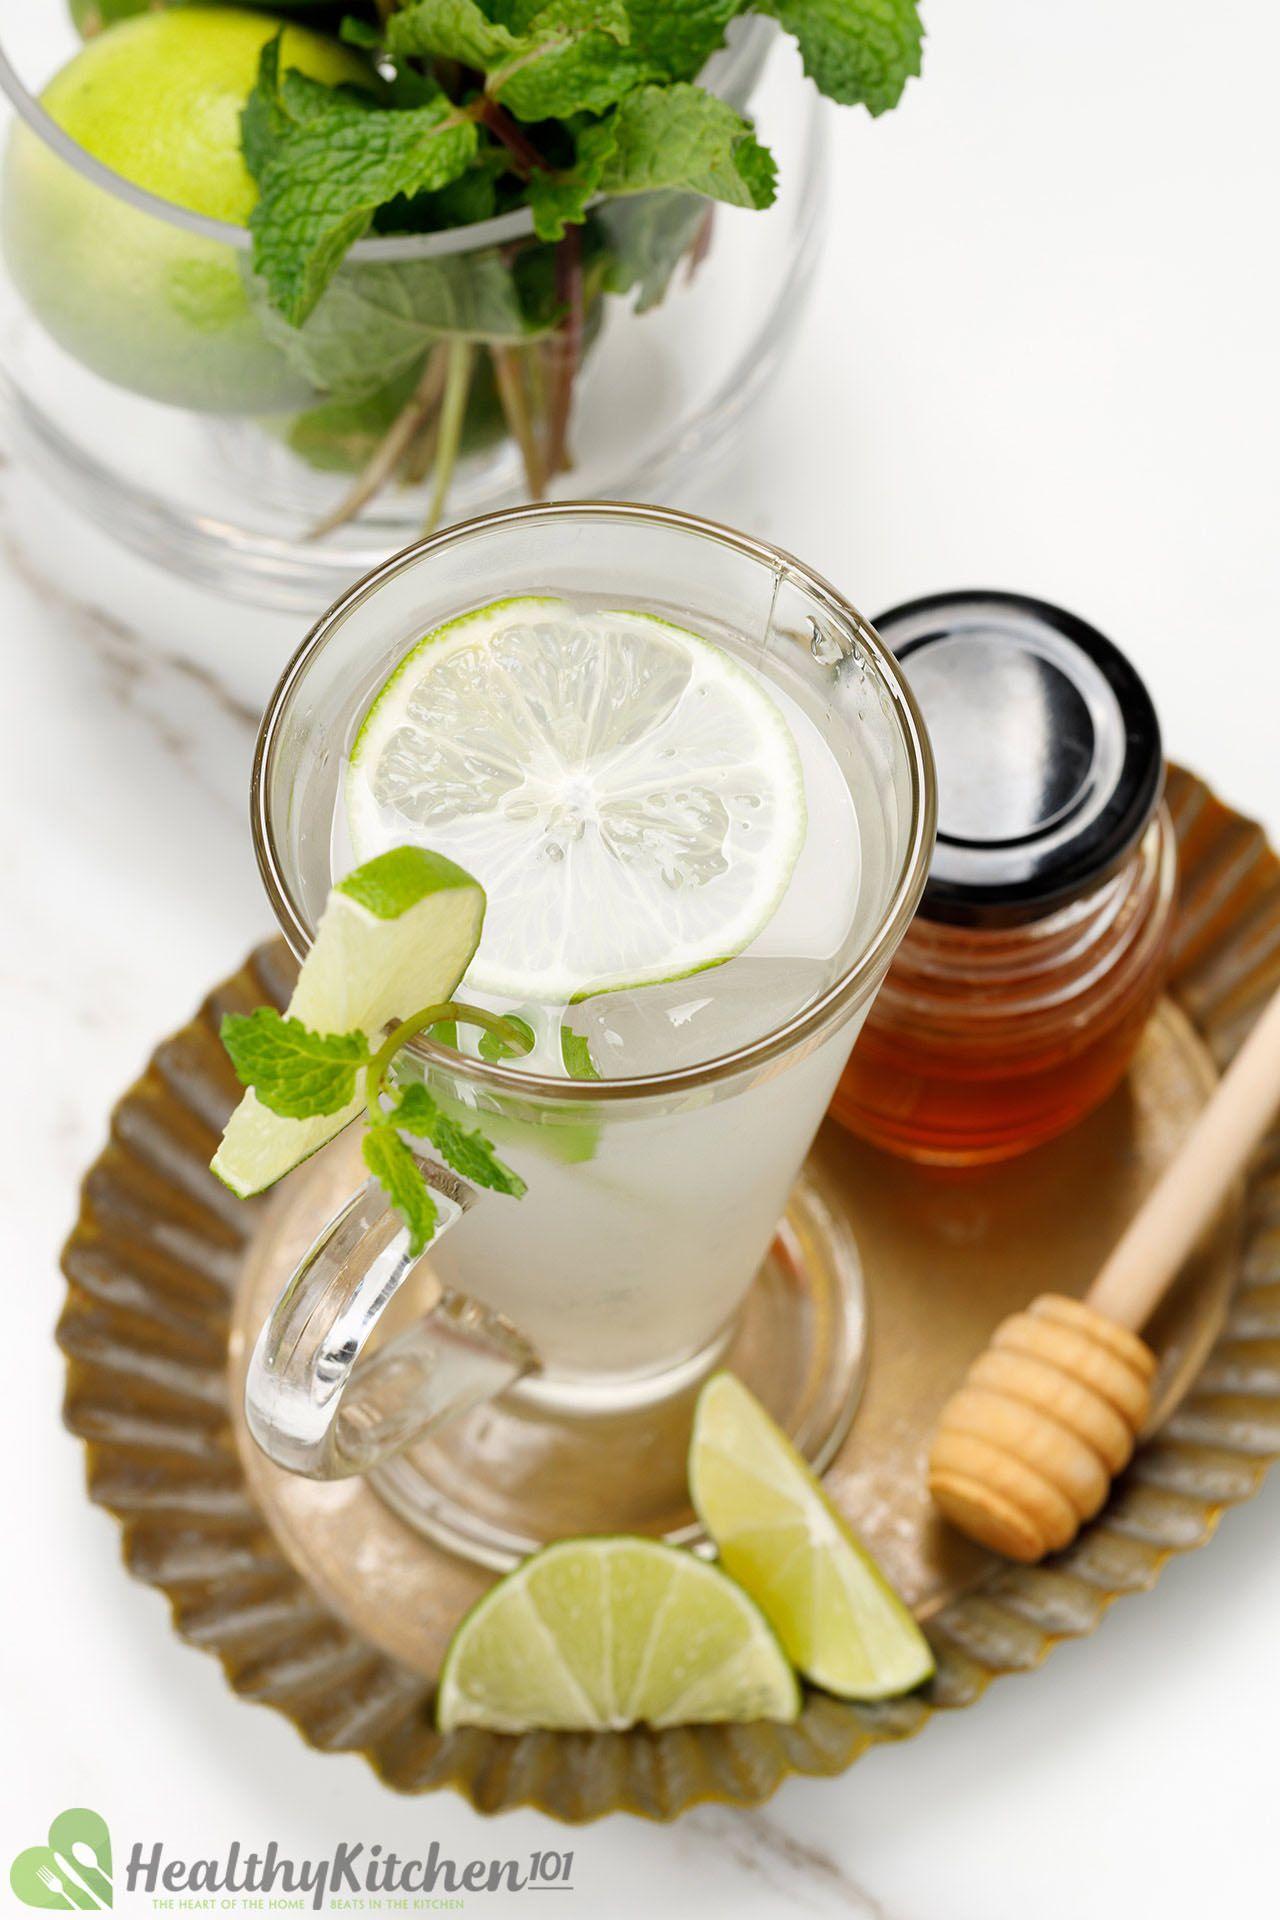 sweetened lime juice recipe